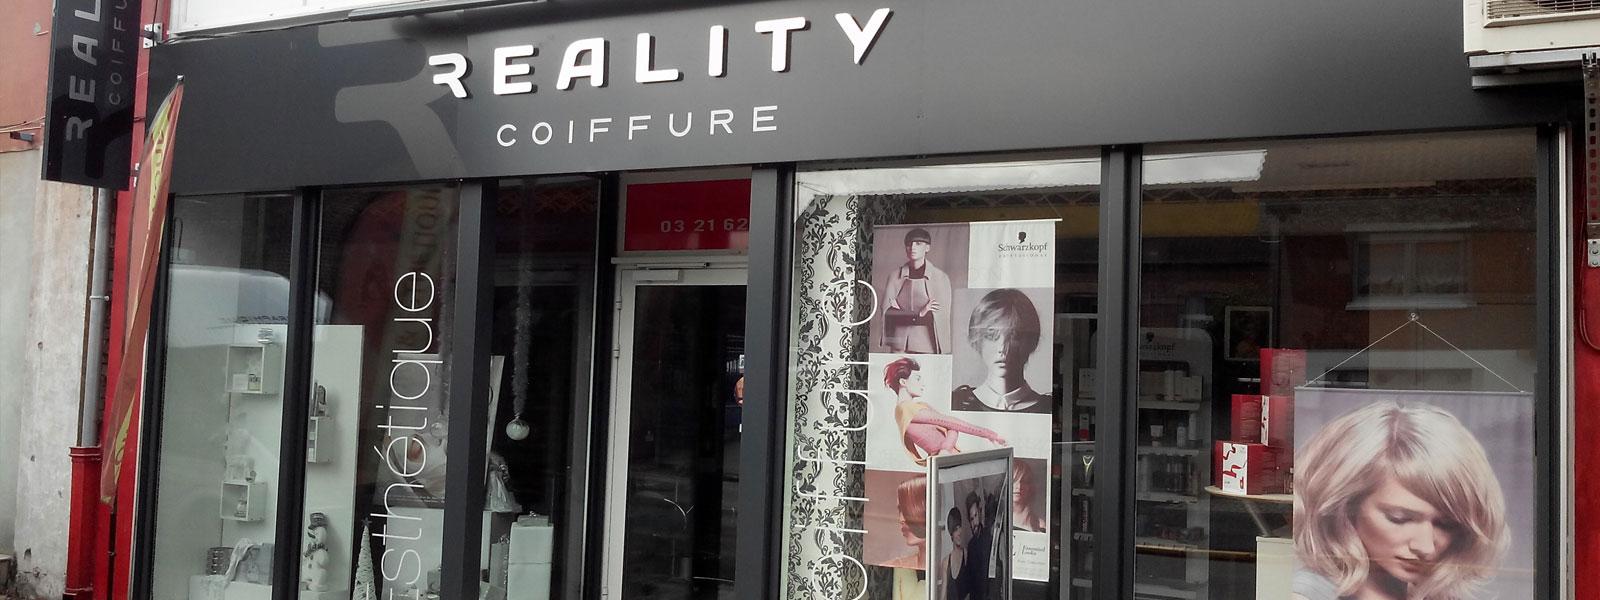 Habillage fa ade de magasin fabrication et pose d 39 enseigne for Devanture salon de coiffure